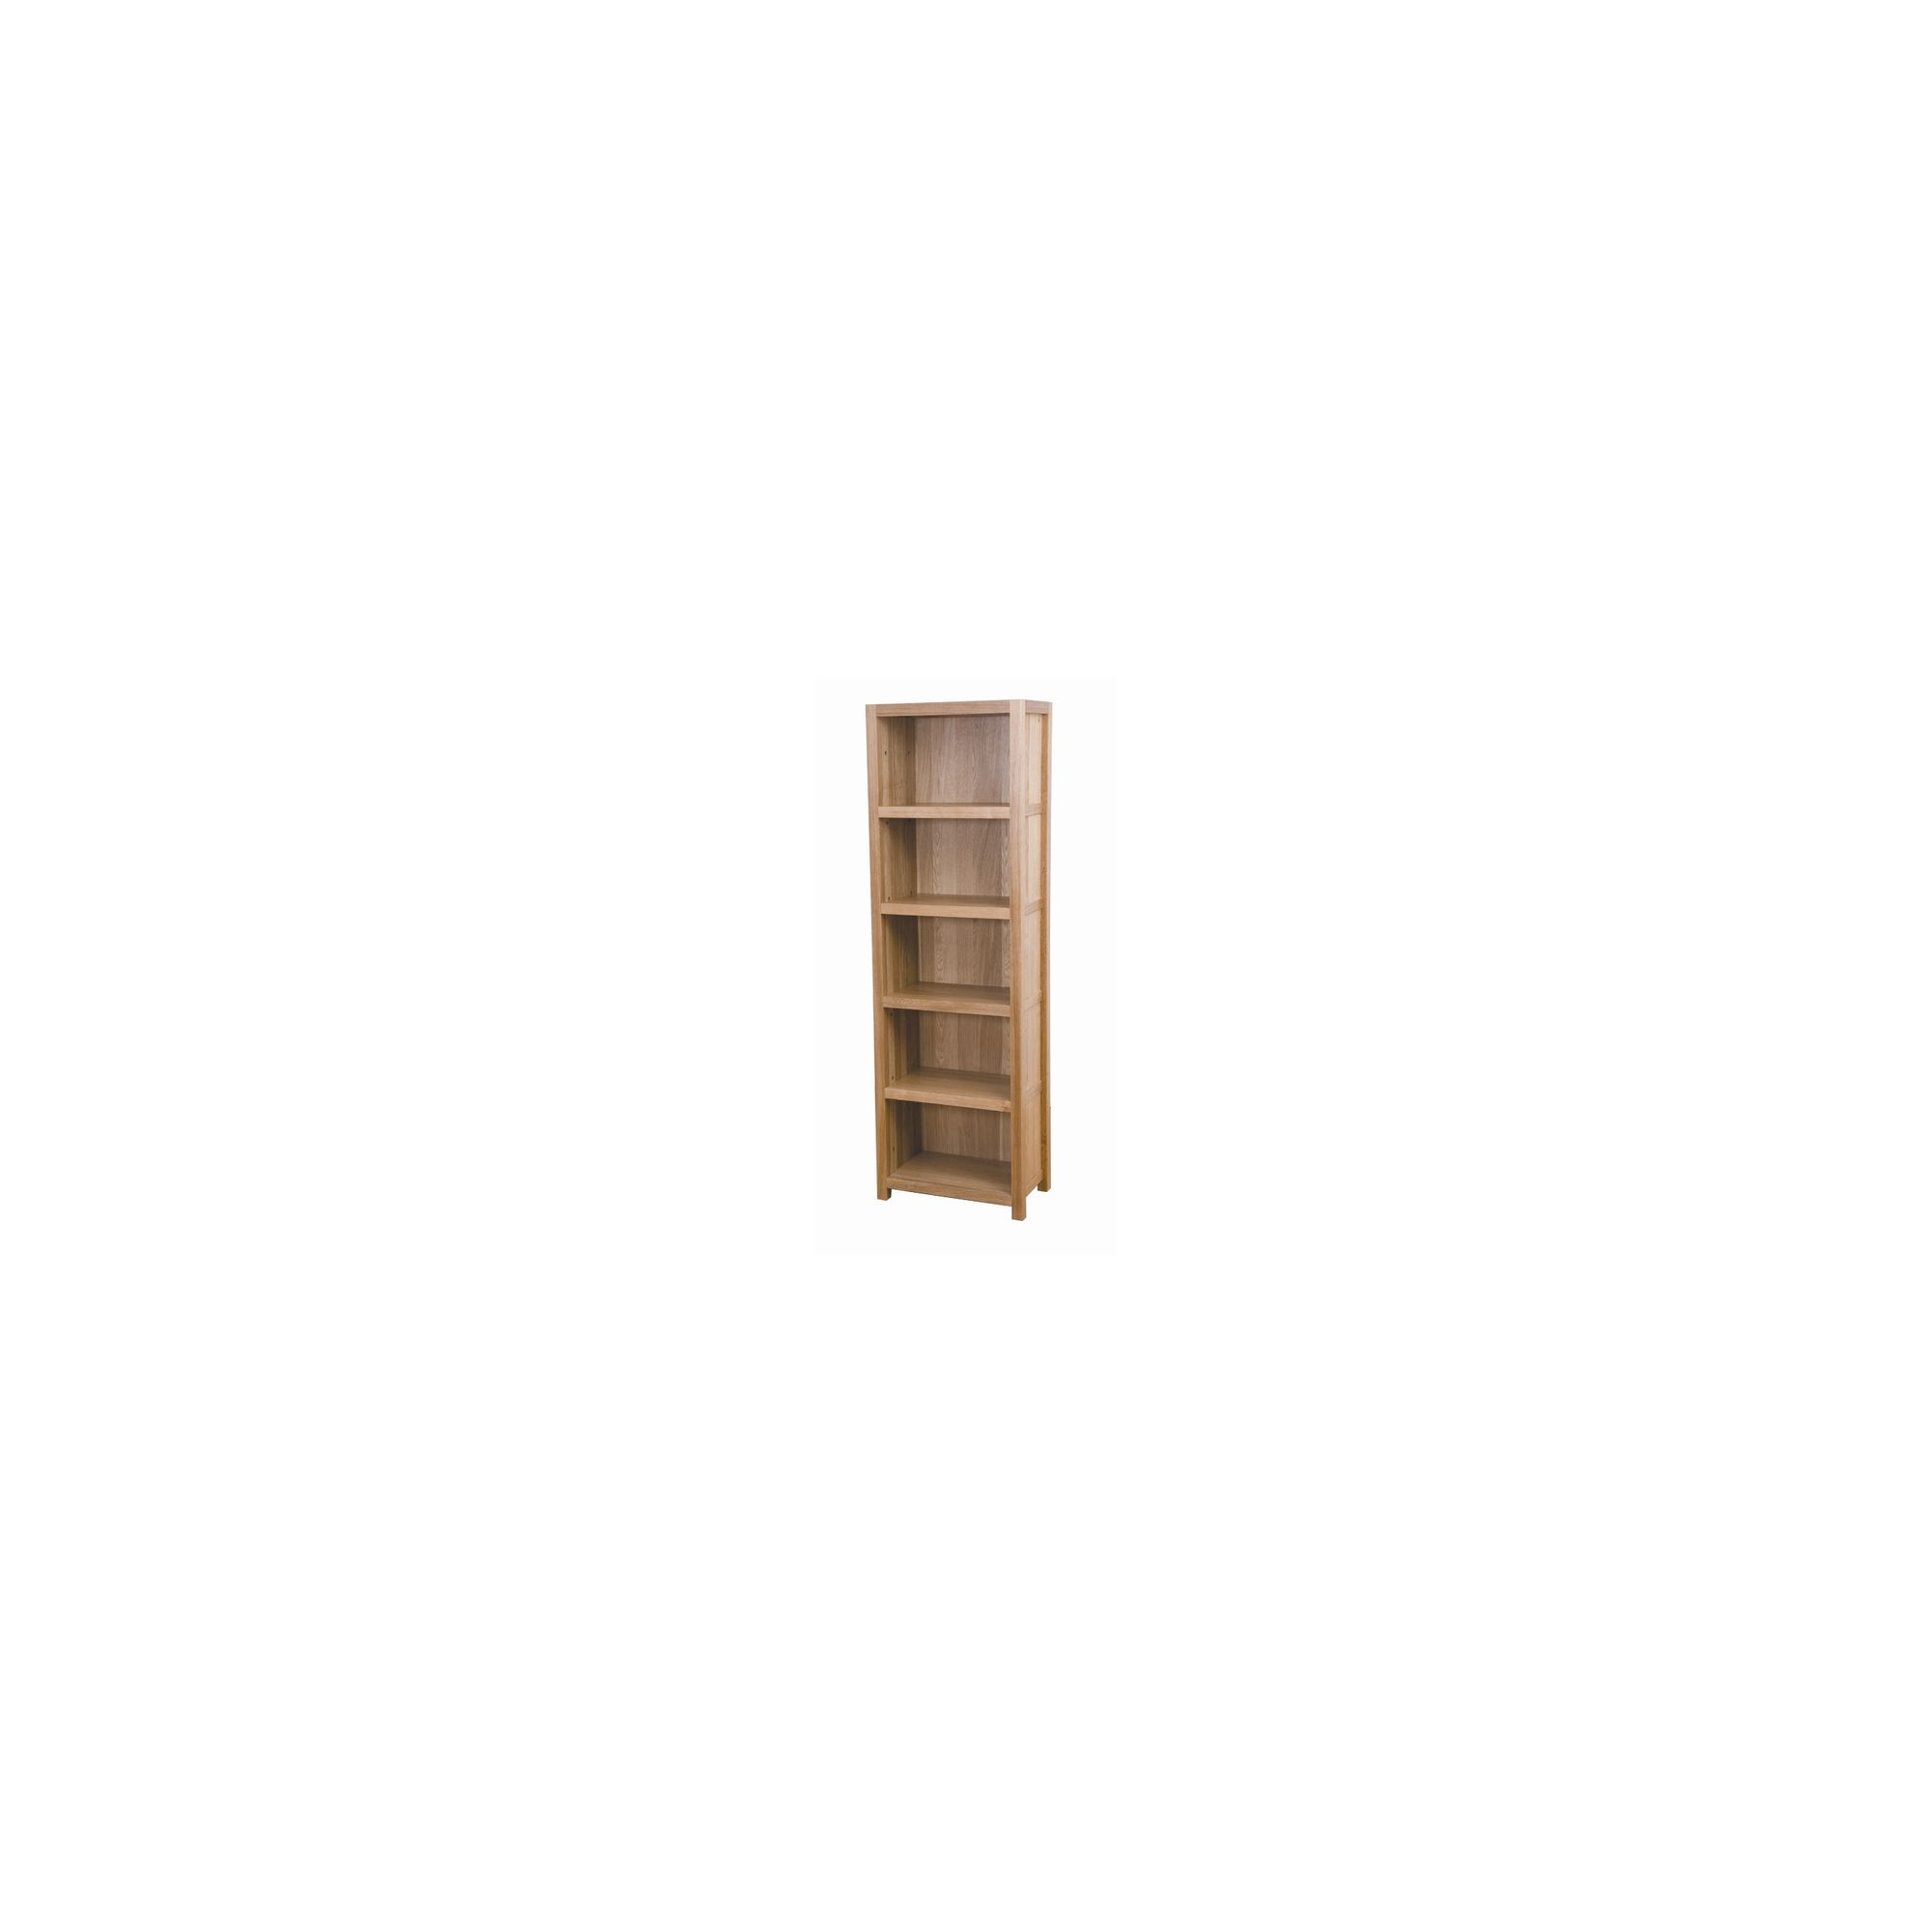 G&P Furniture Tall Oak Bookcase at Tesco Direct